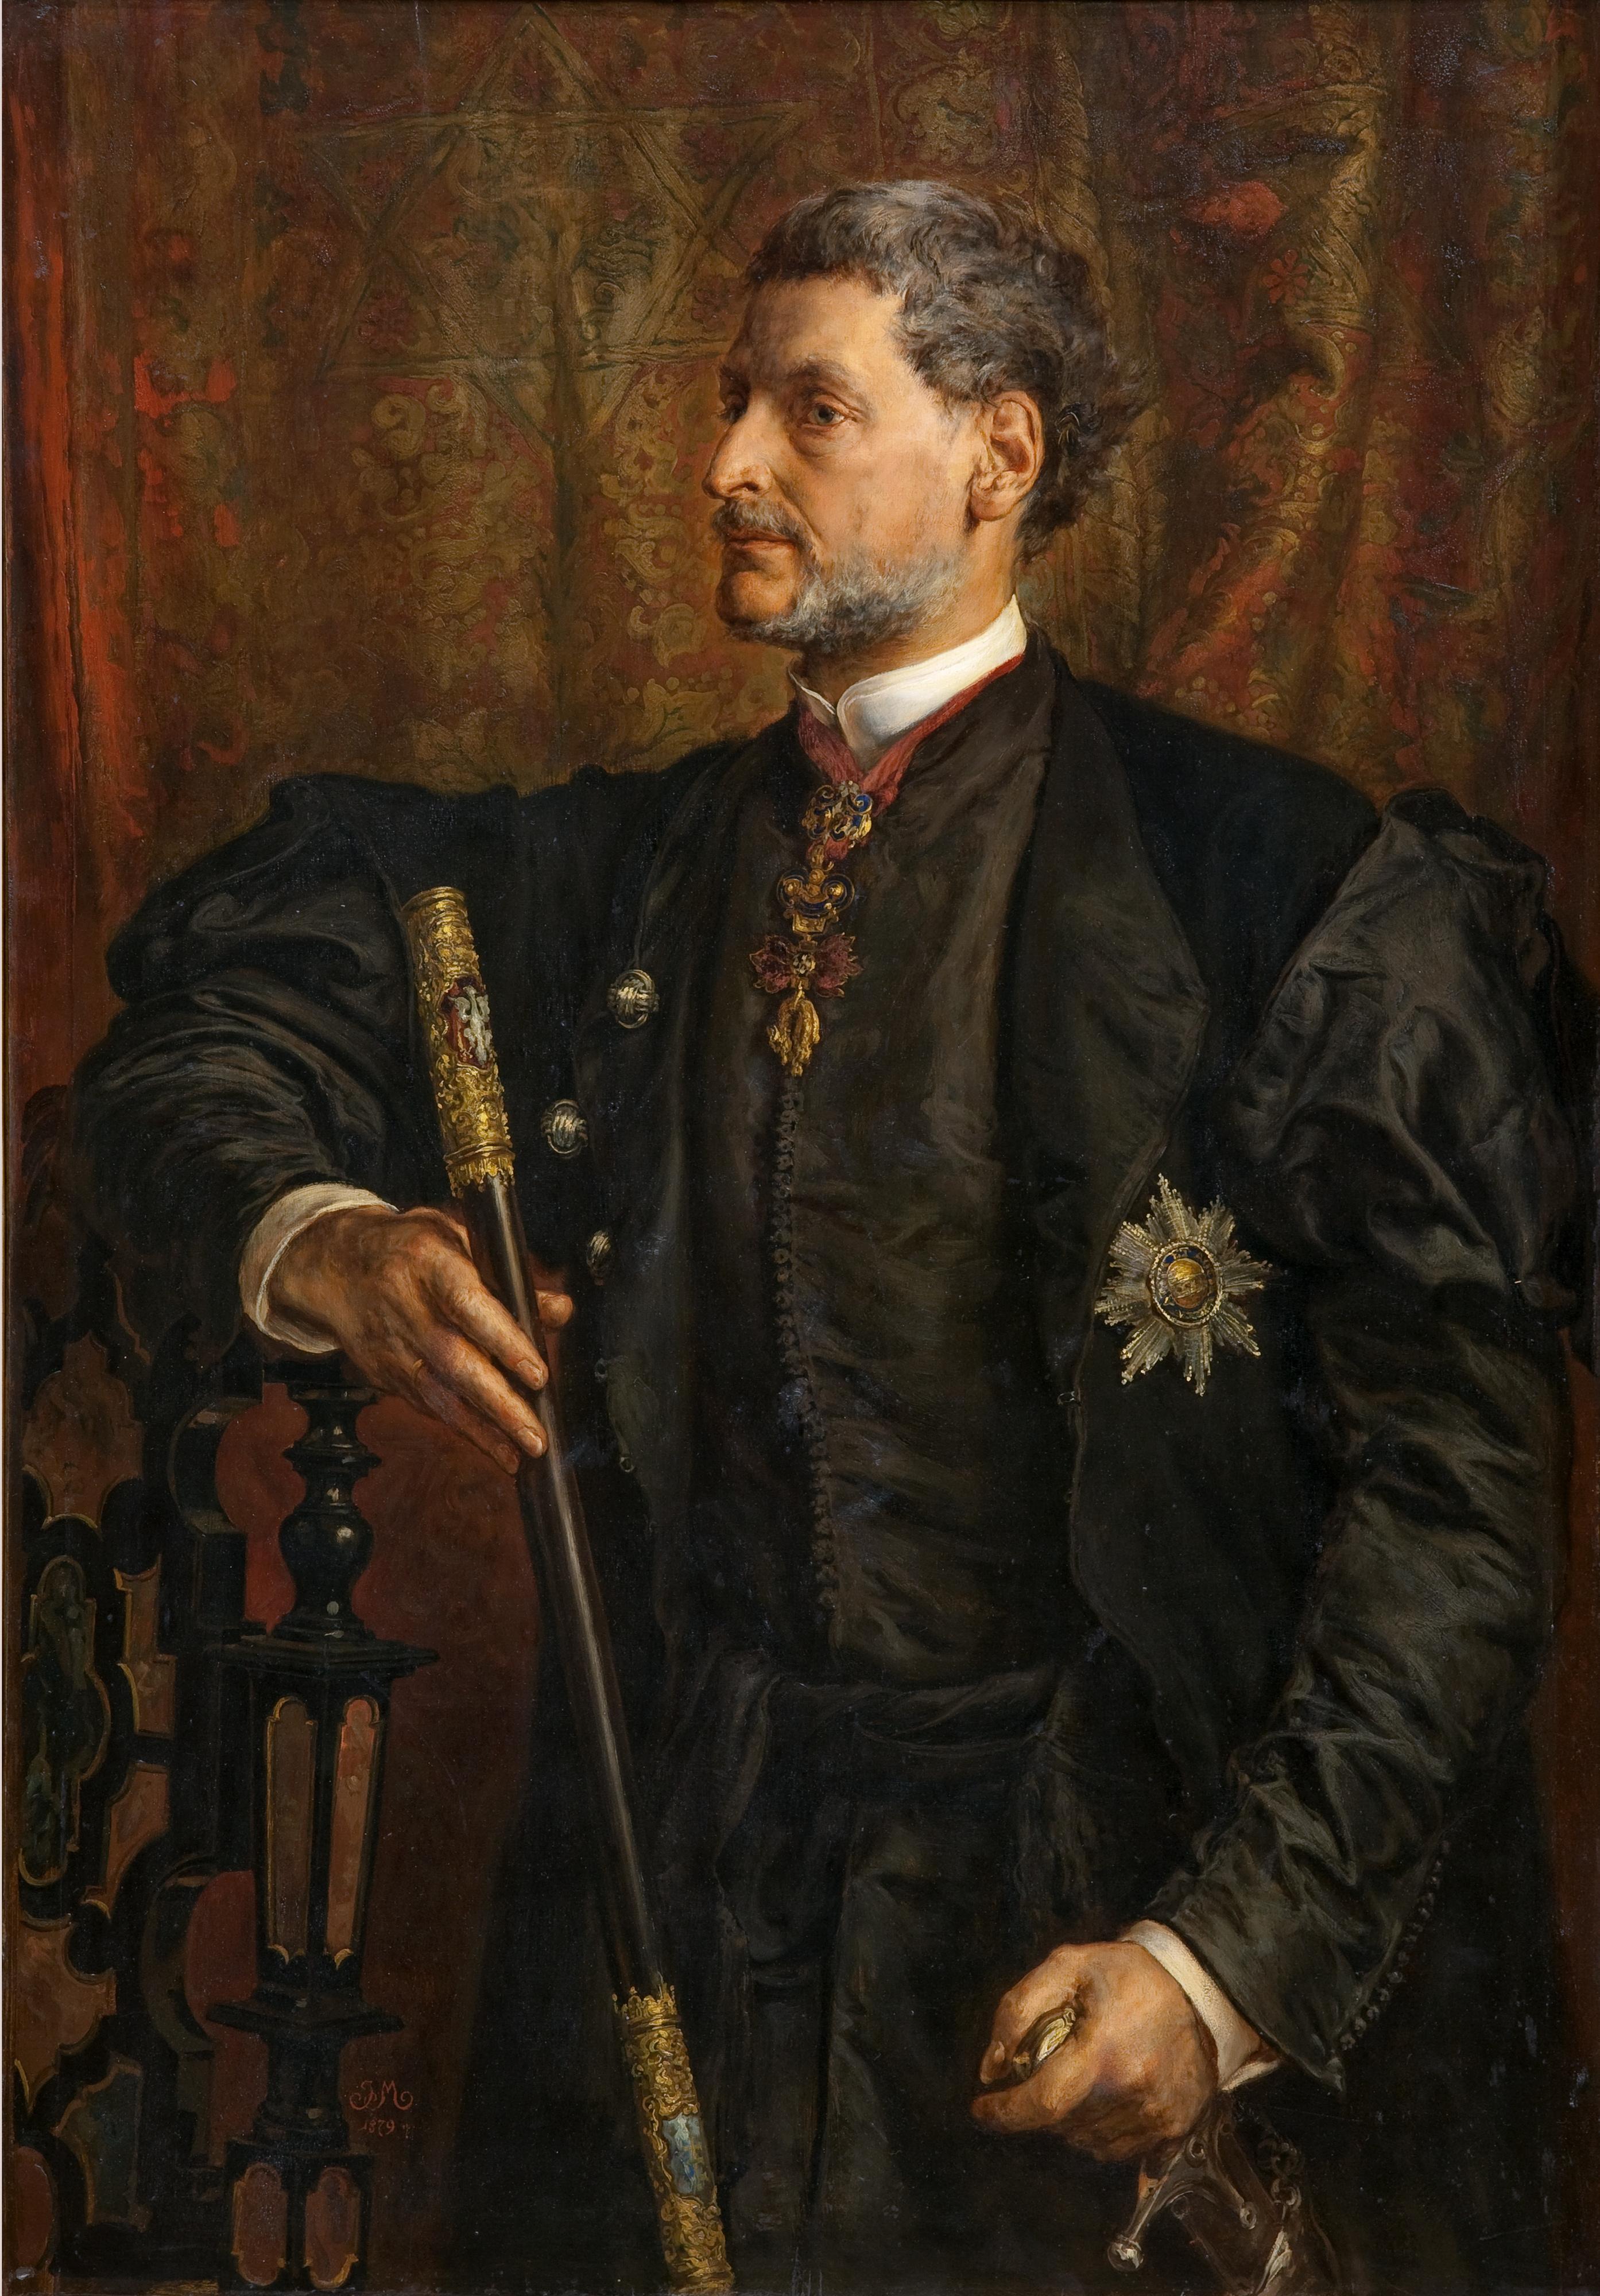 Jan Matejko festménye Potockiról